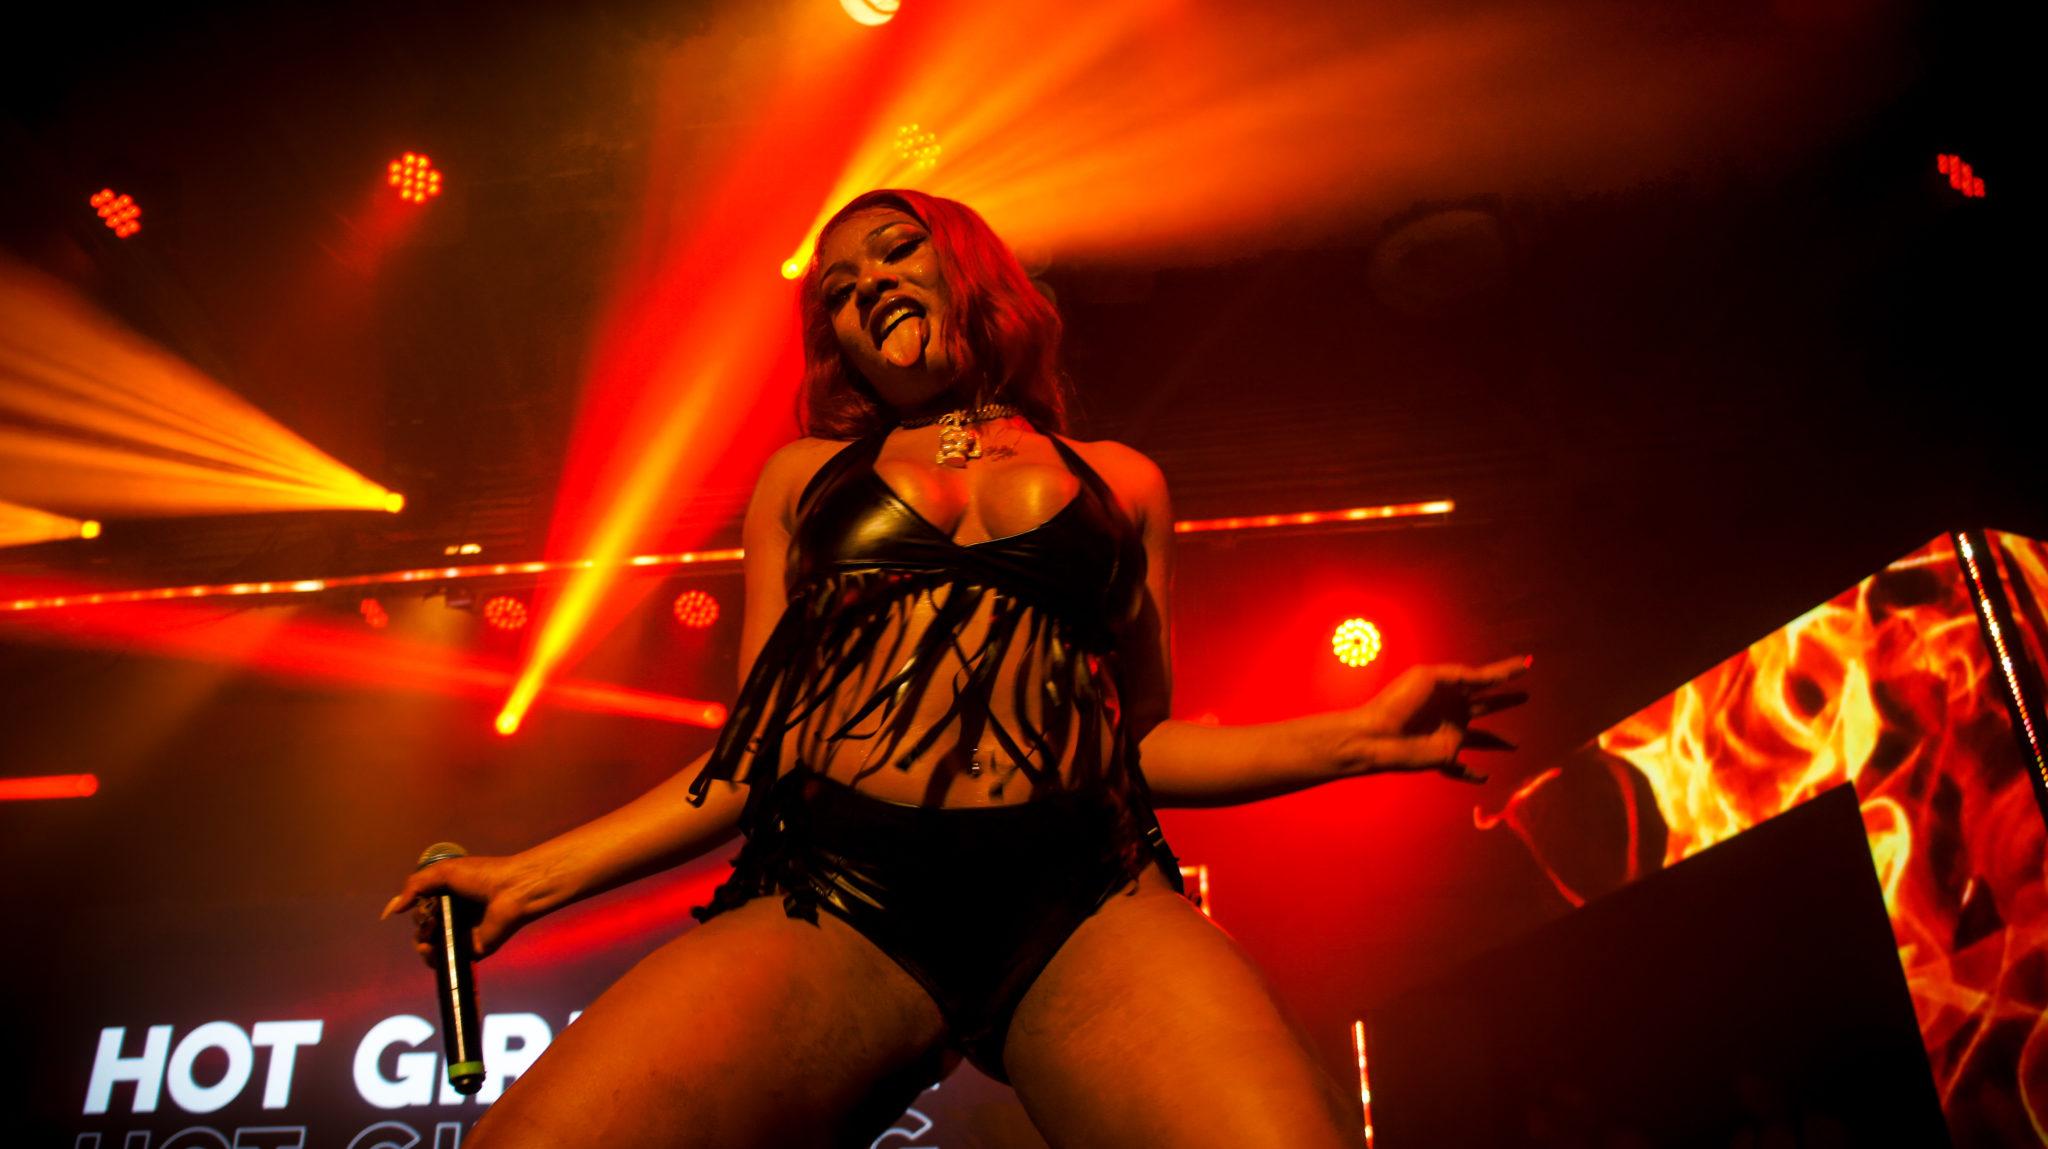 H-Town Hottie: Megan Thee Stallion Houston Show Recap